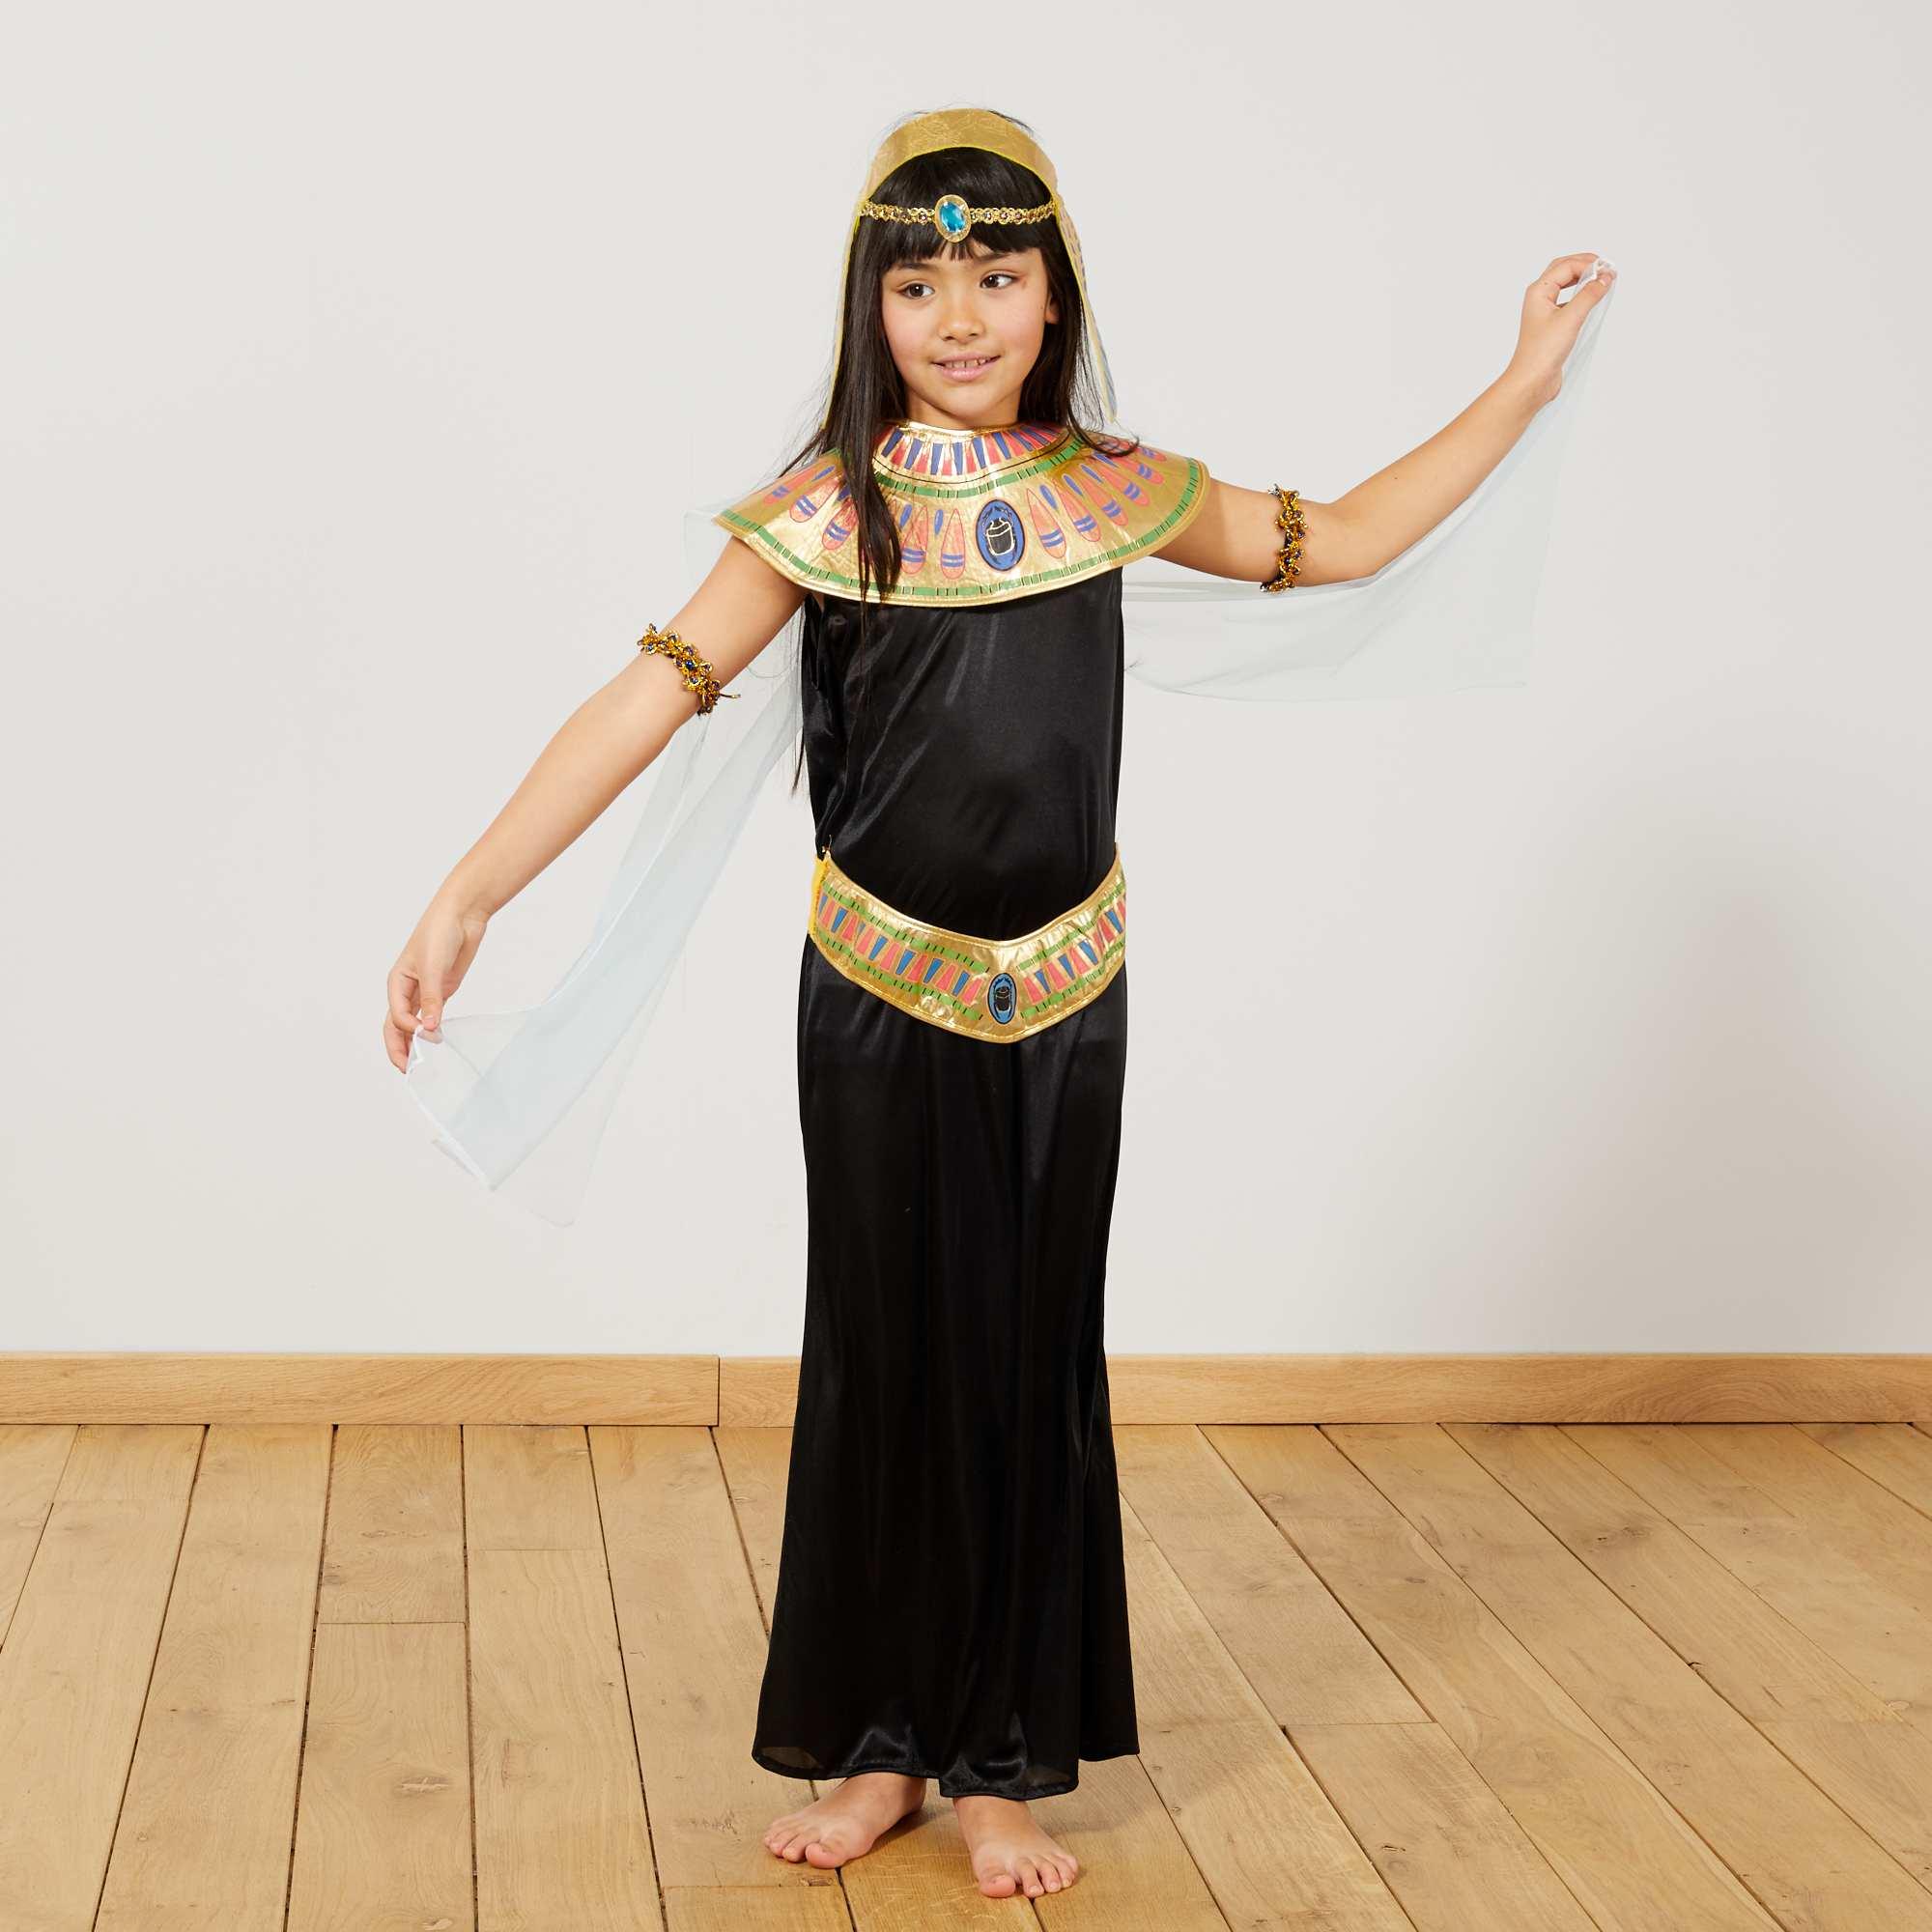 7ebd7f234f3ad Déguisement egyptienne Enfant - noir - Kiabi - 22,00€